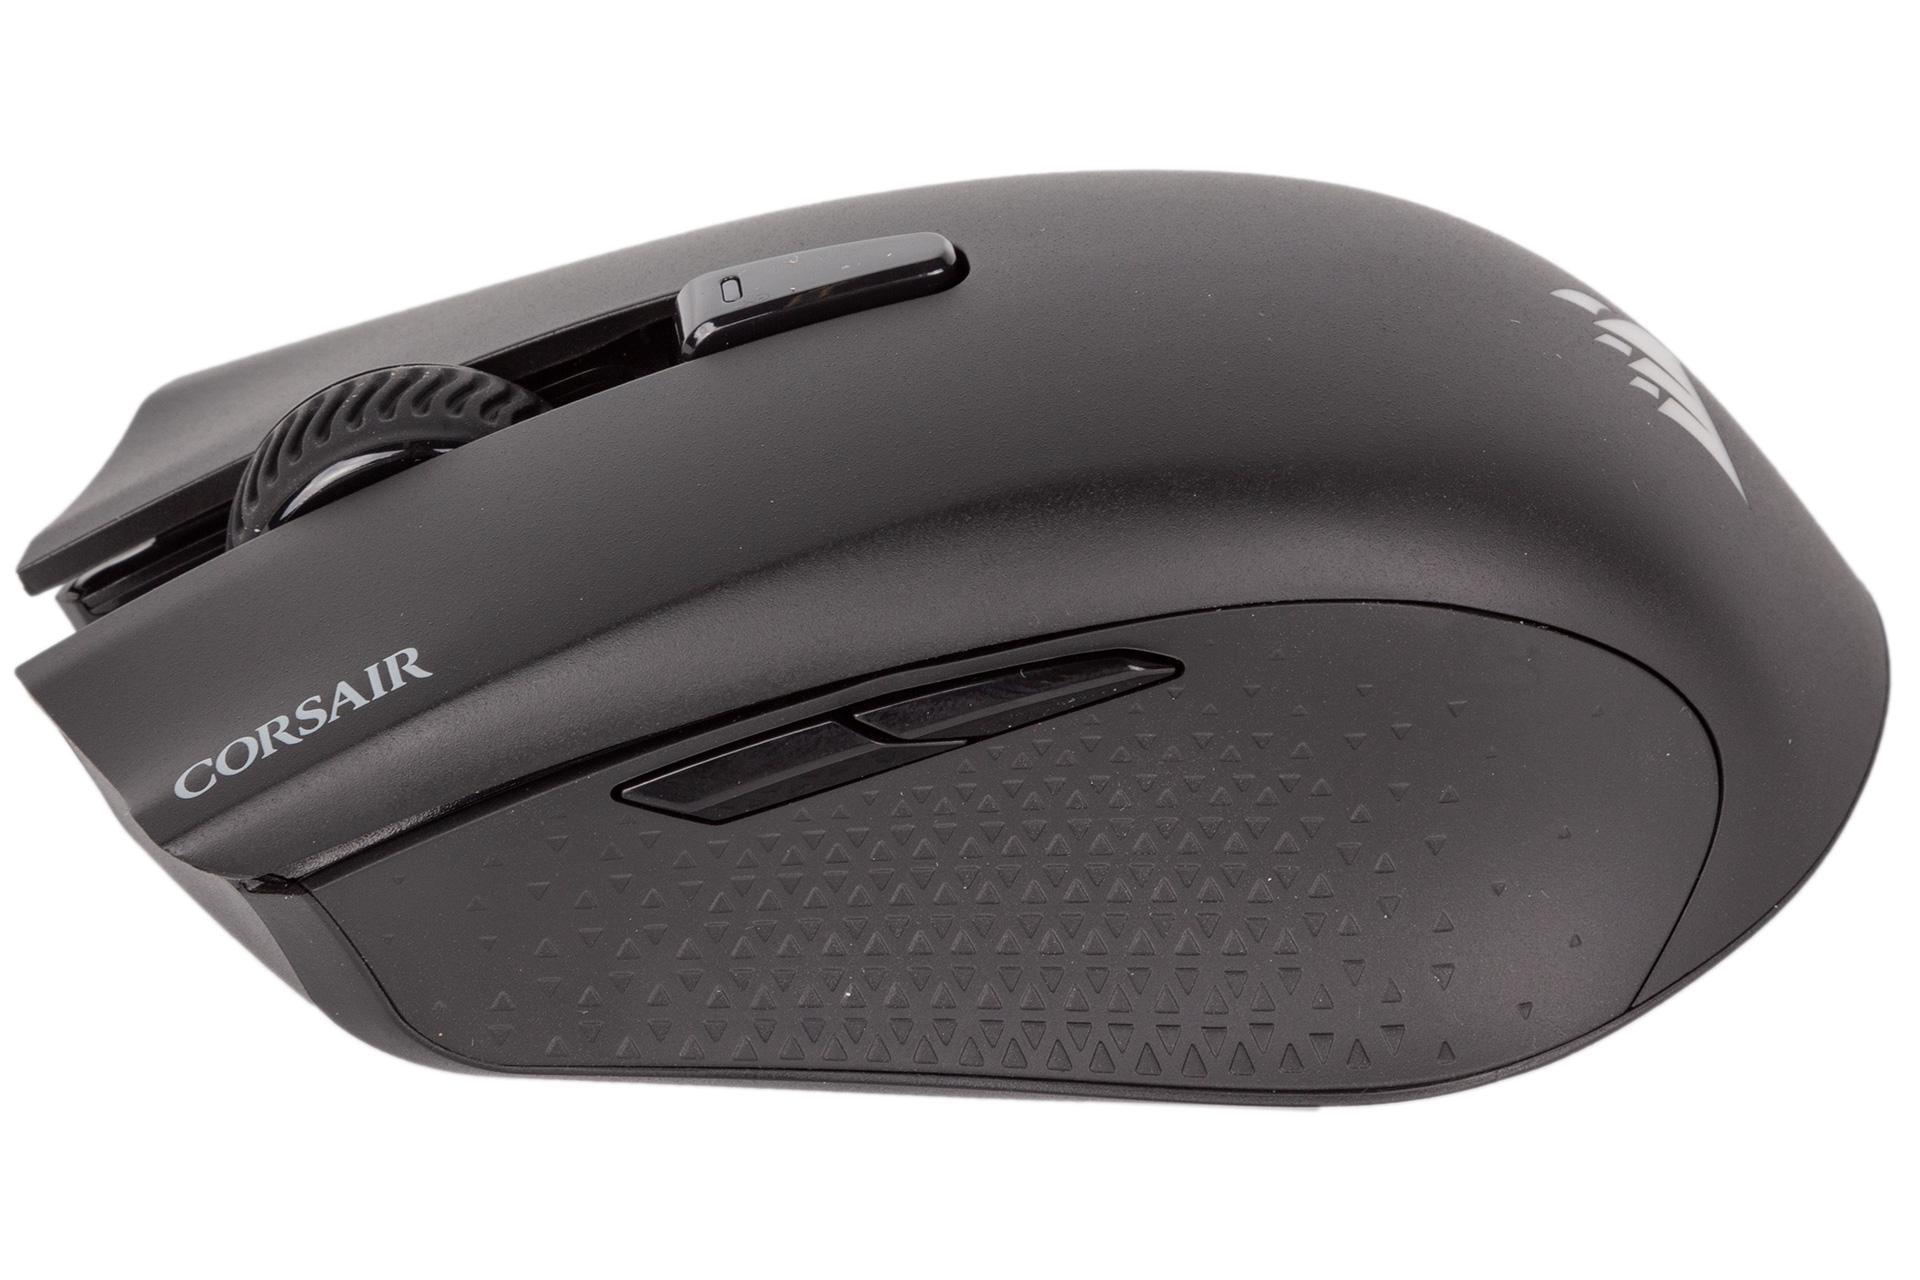 Corsair Harpoon RGB Wireless Review | bit-tech net